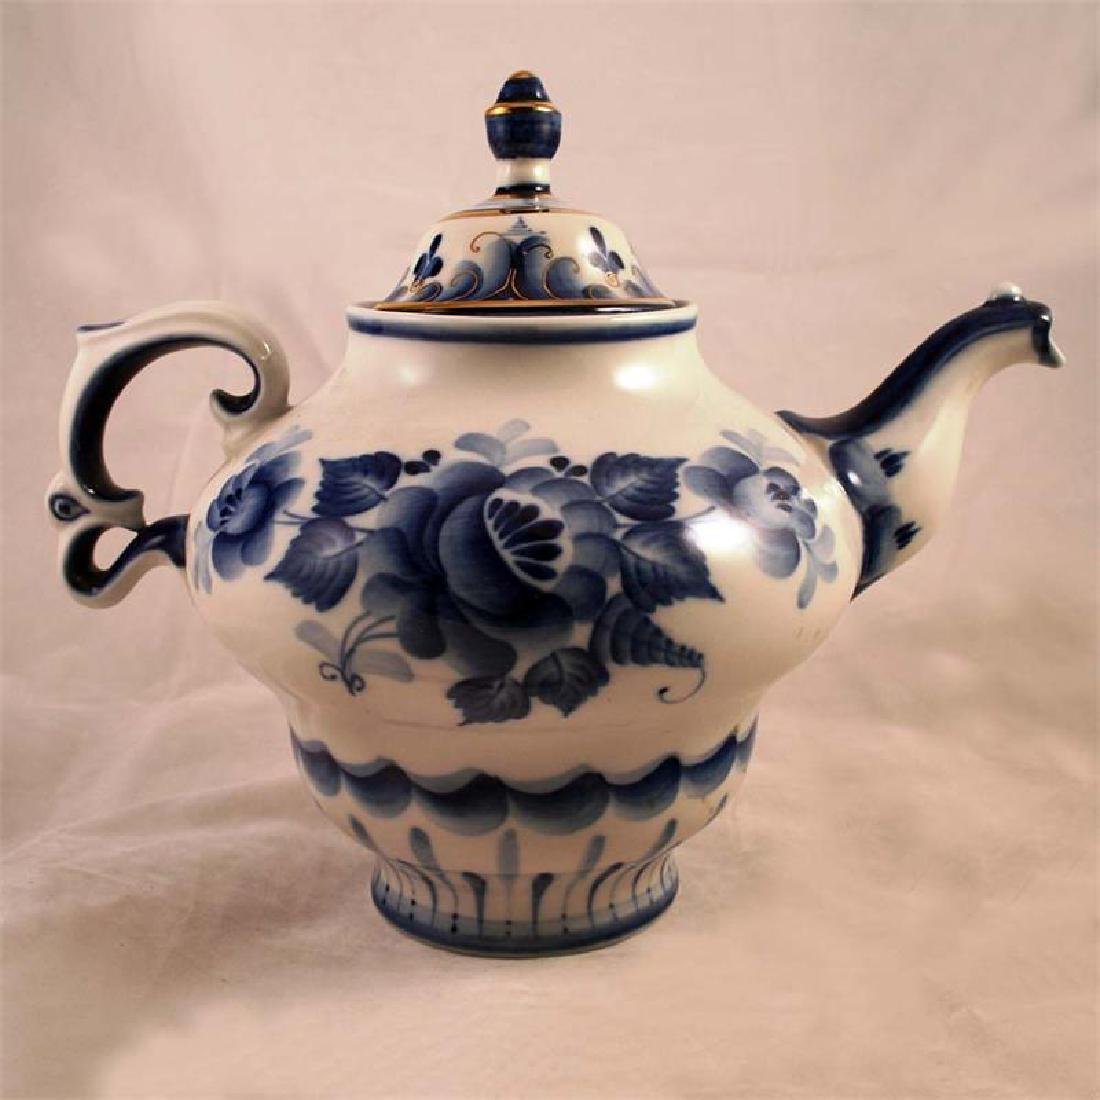 Large Maliavina Ceramic Teapot